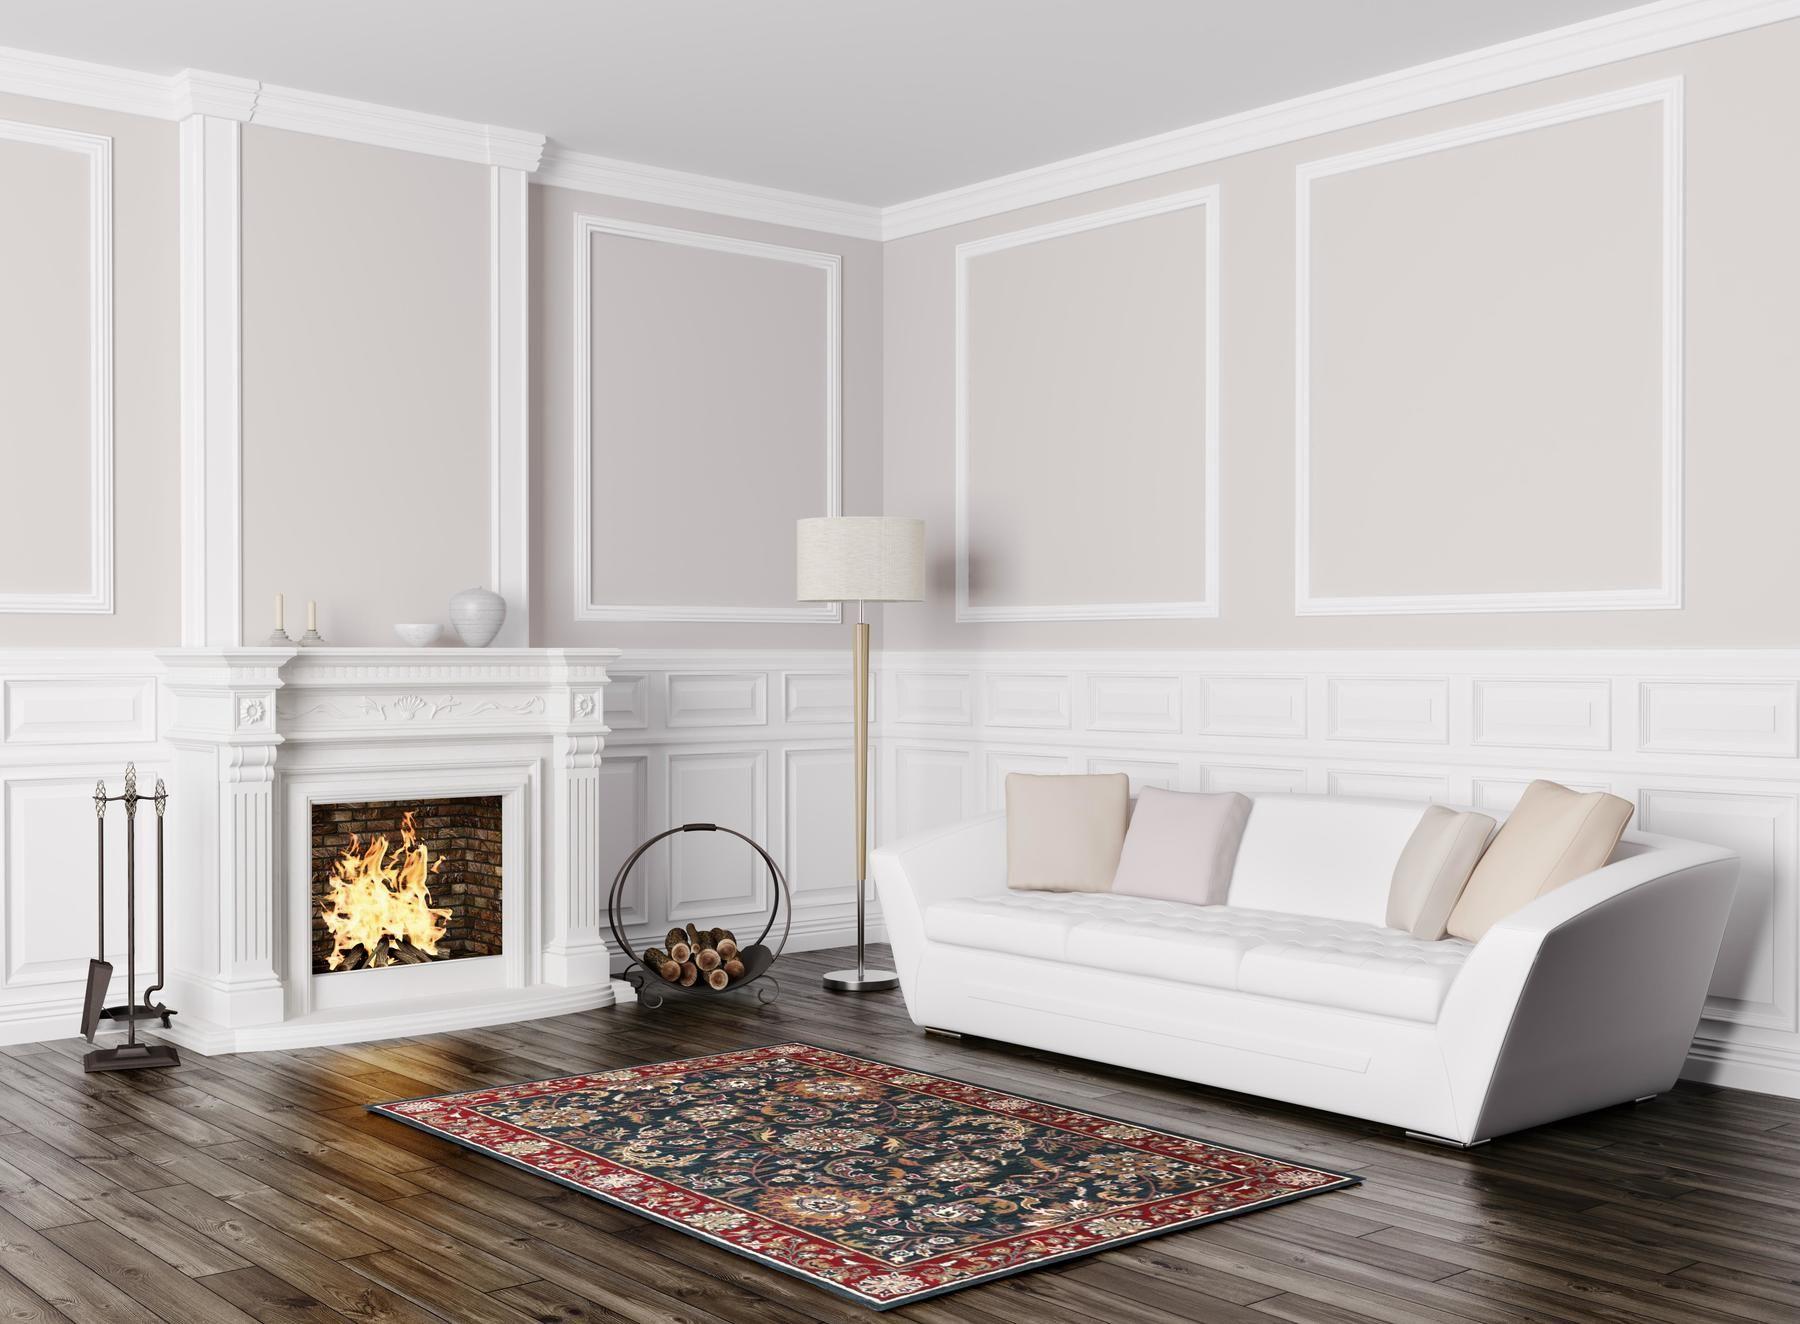 Kashan Rug Color Navy Size 8 x 11 Burgundy rugs